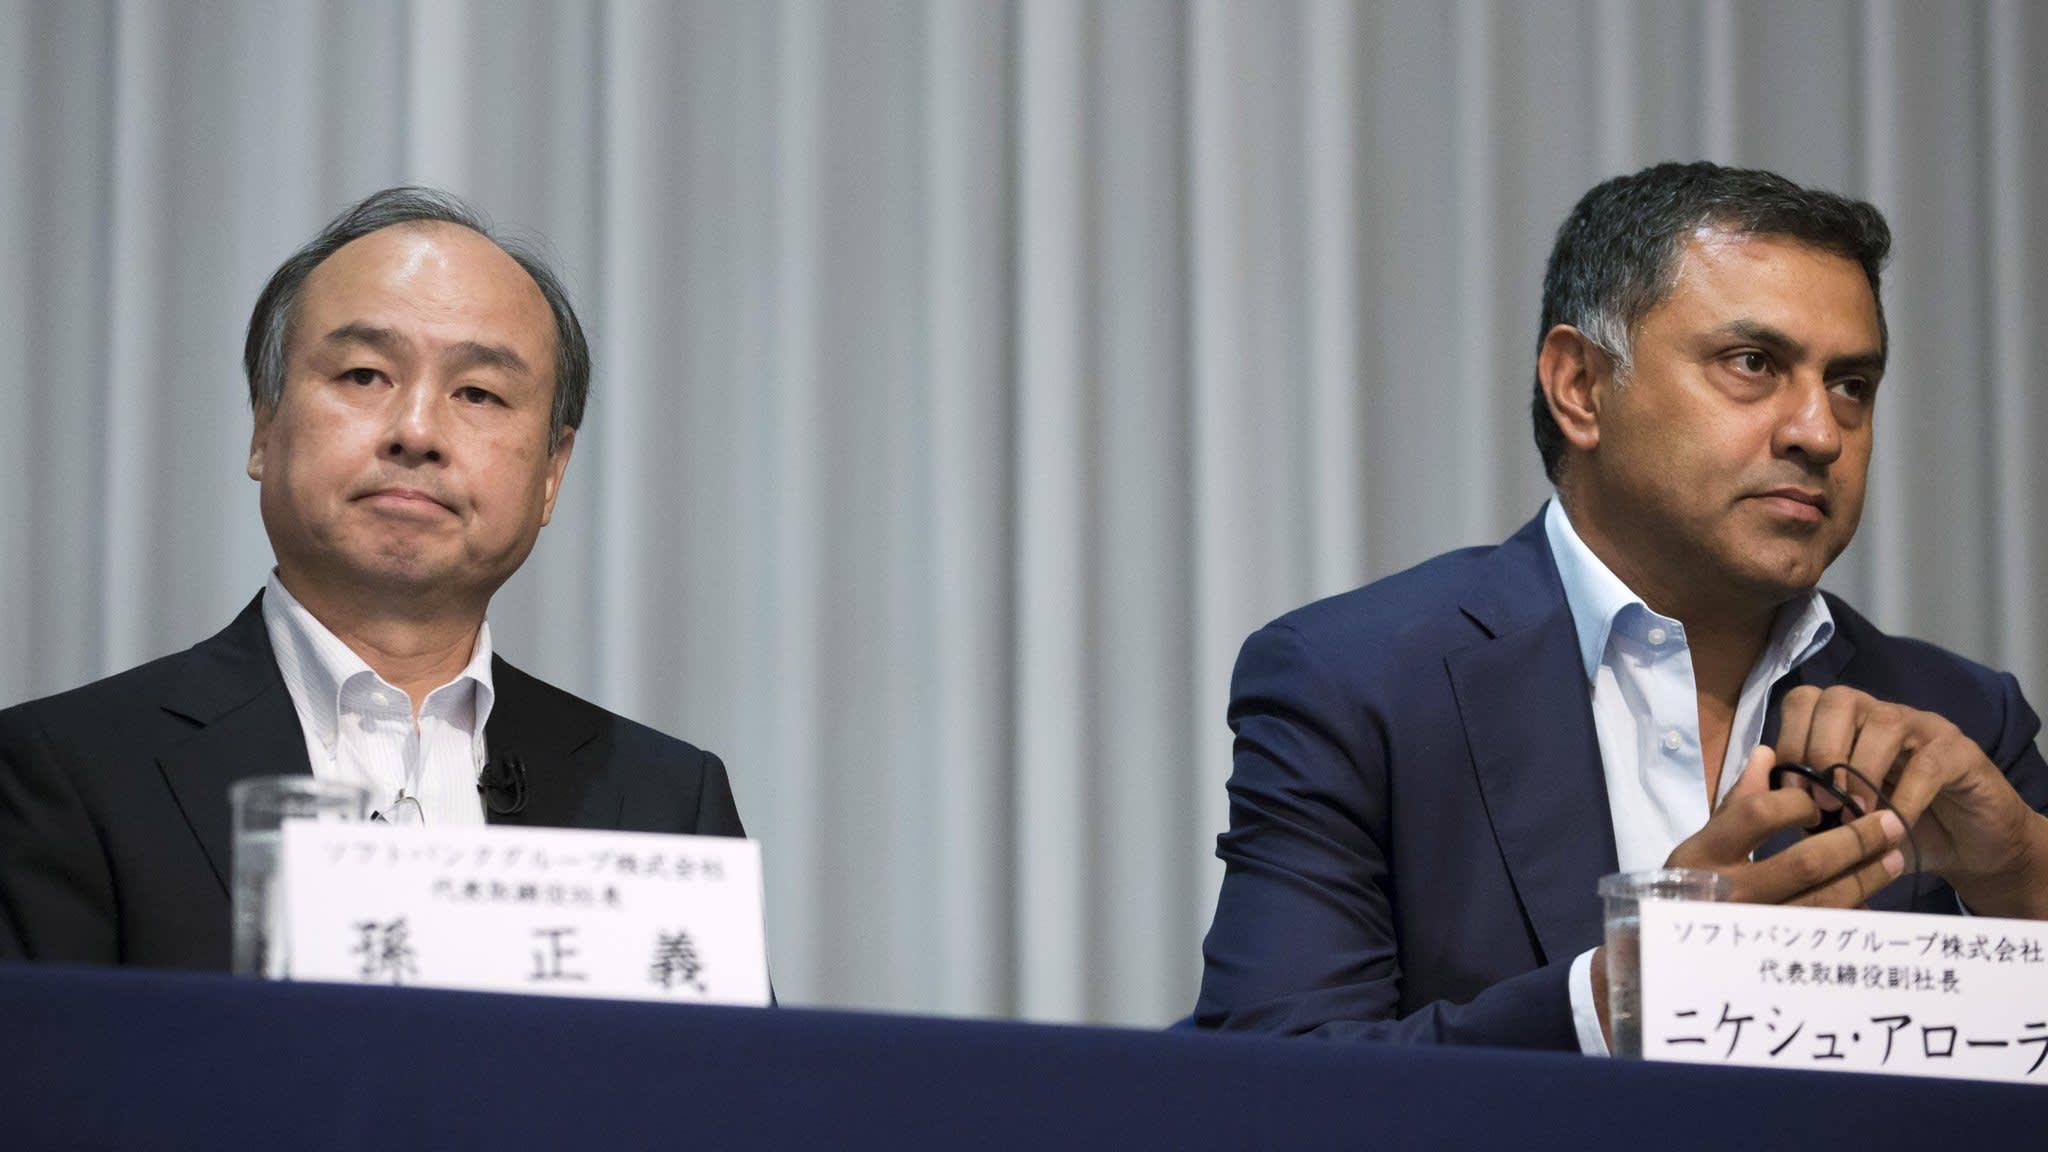 SoftBank opens investigation into shareholder campaign